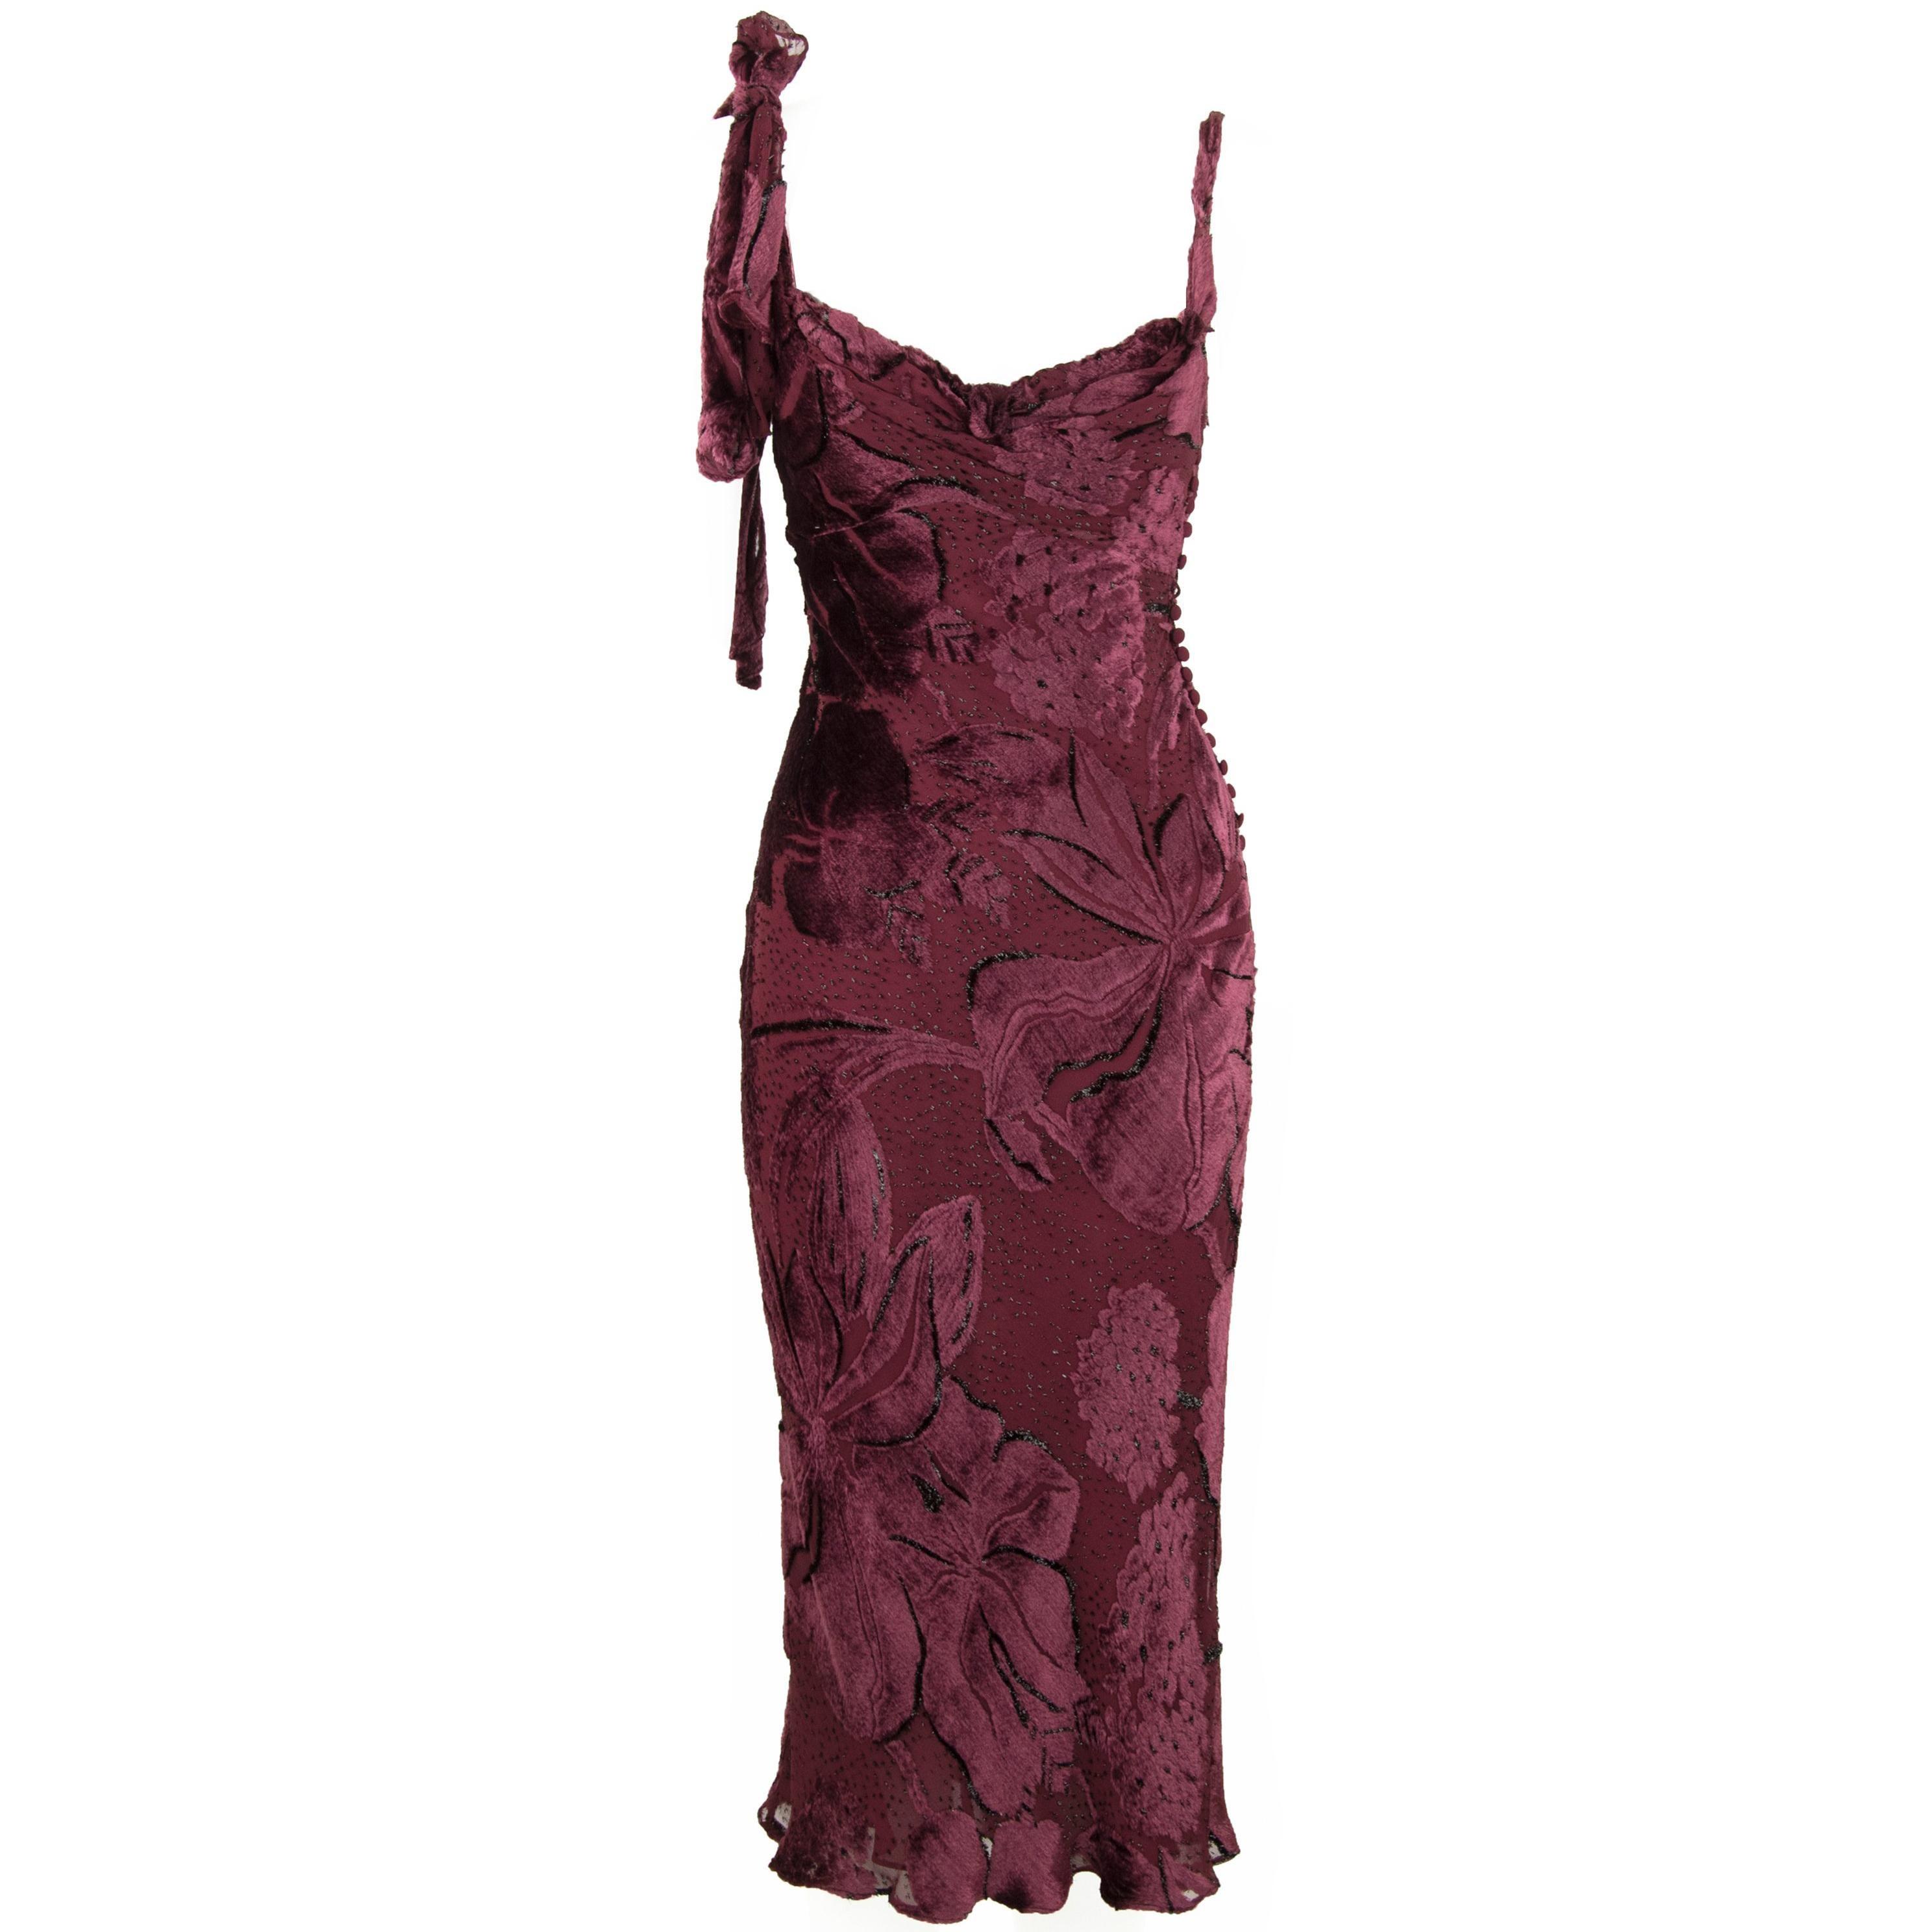 552732eda761b Vintage John Galliano: Dresses, Skirts & More - 266 For Sale at 1stdibs -  Page 3